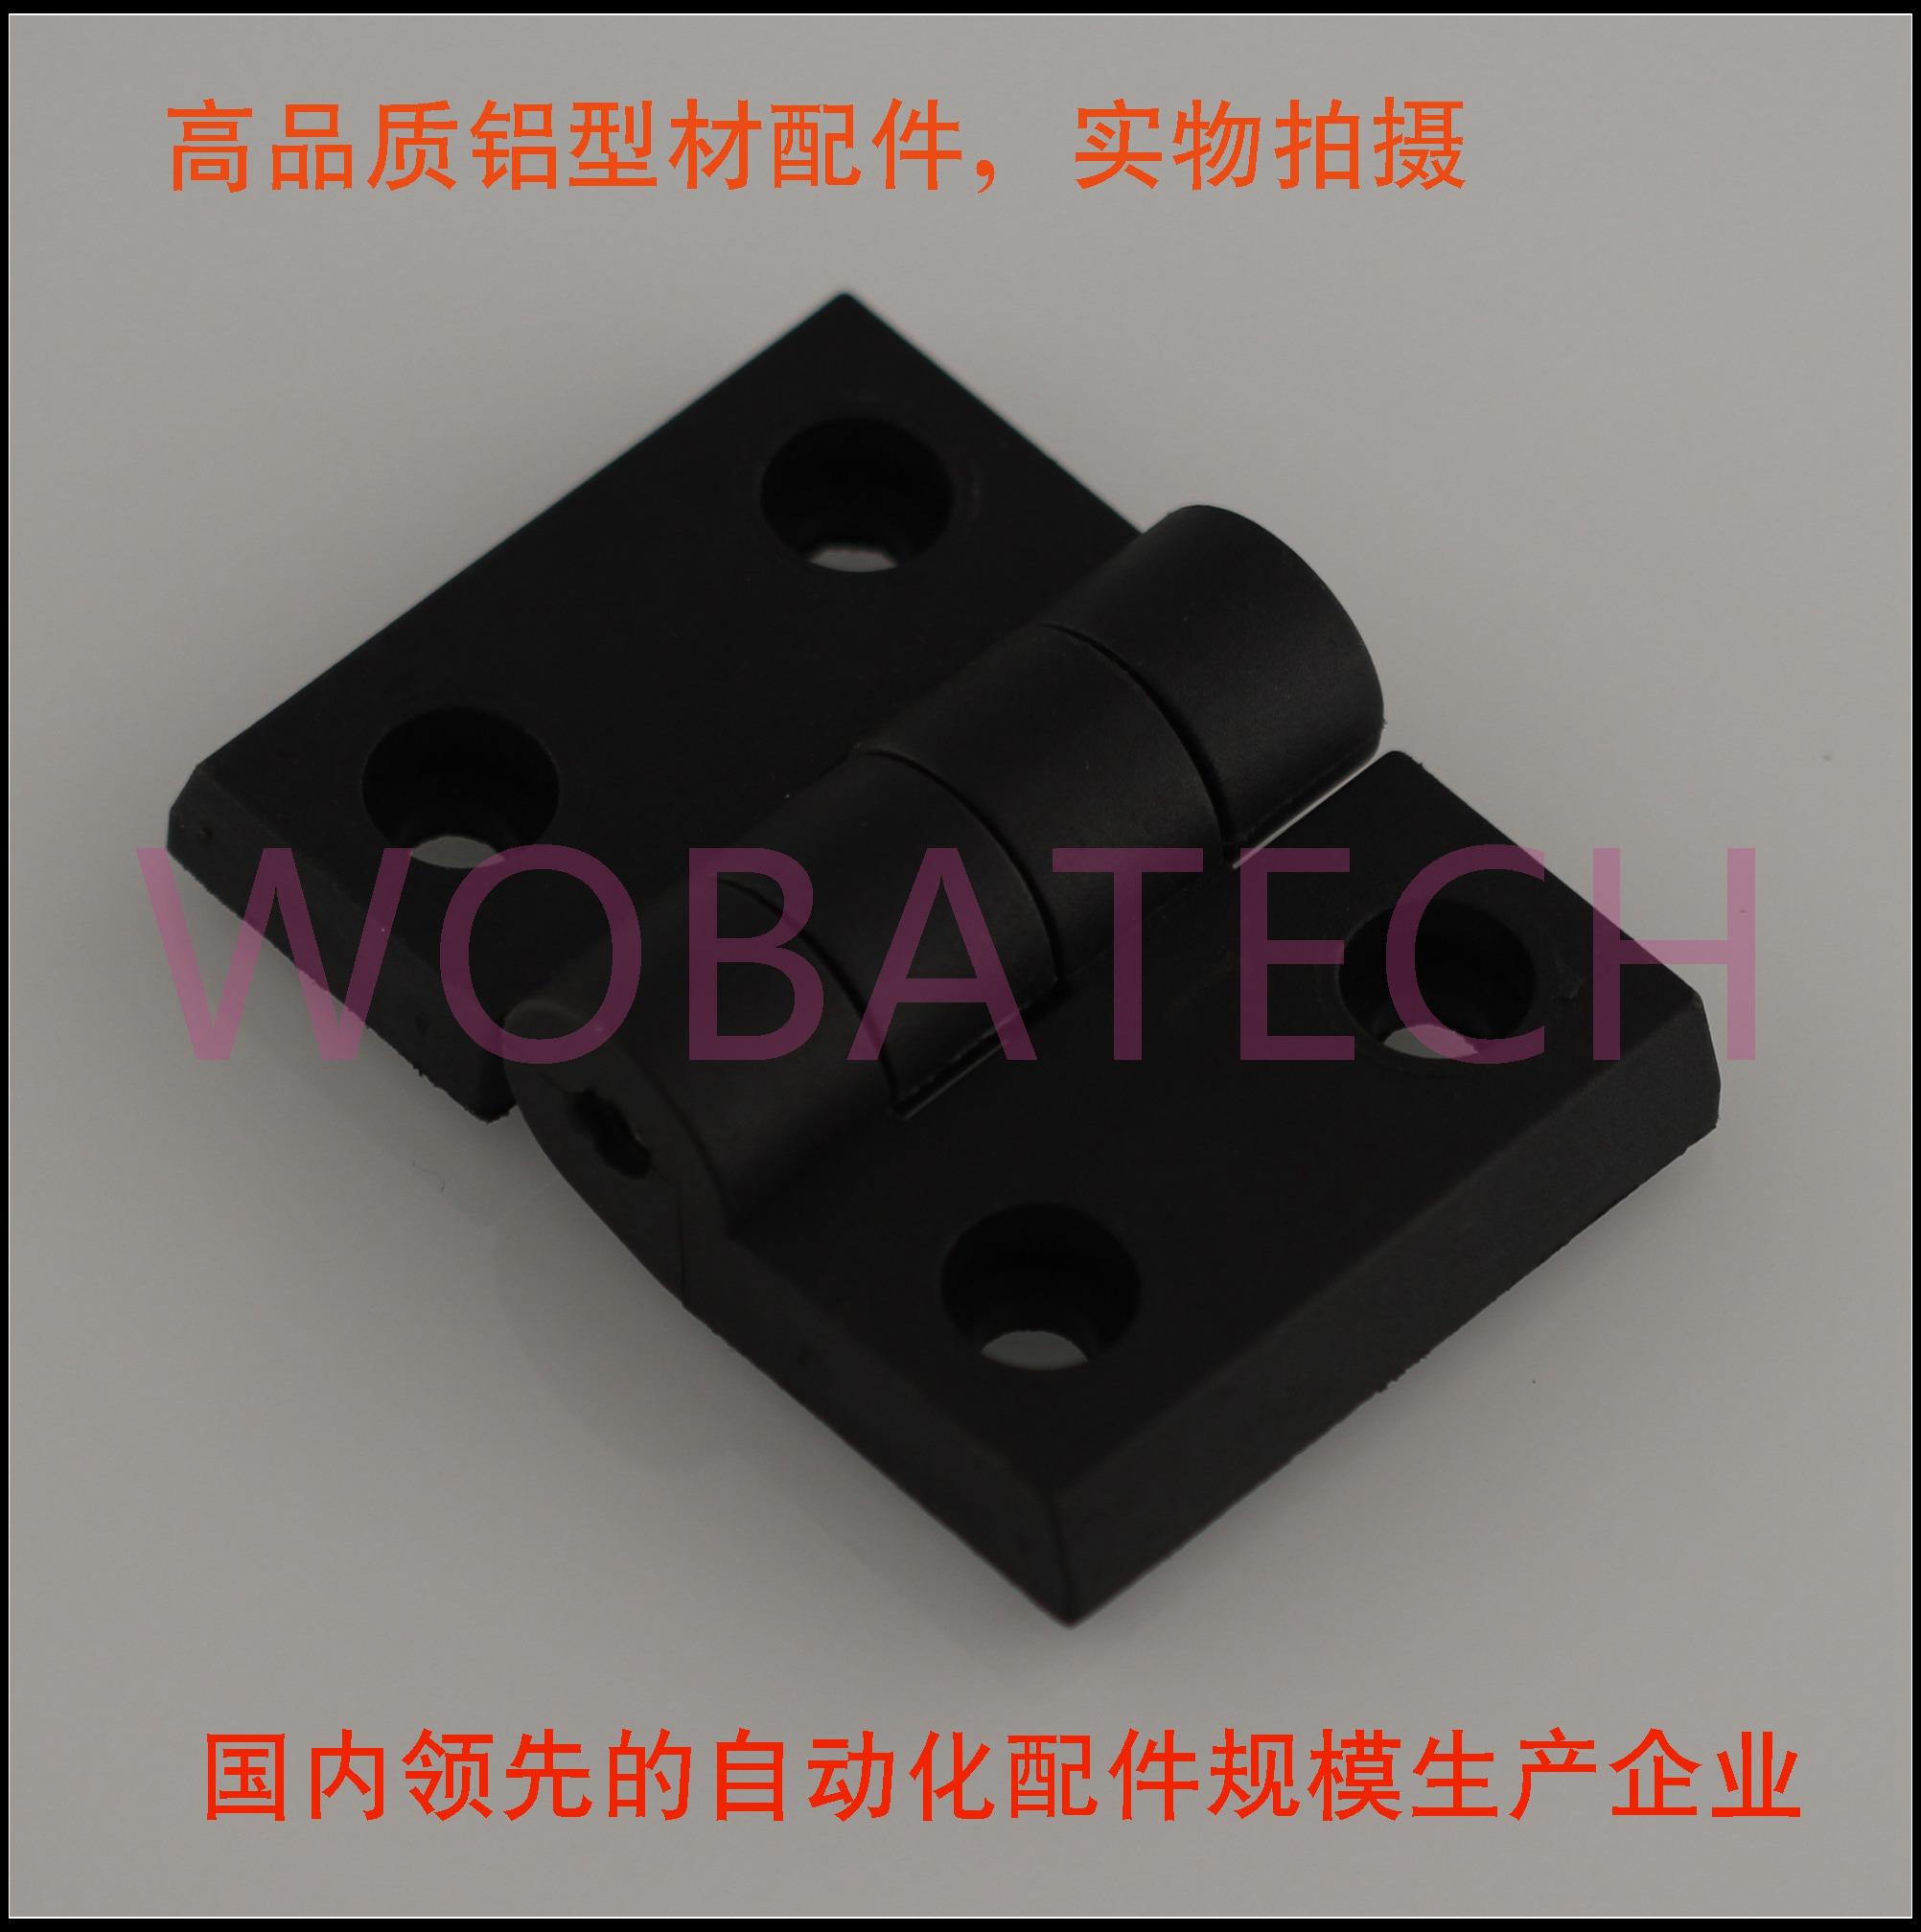 4545 slot 10 series aluminum parts reinforced nylon material is not removable plastic hinge 45Hinge-U